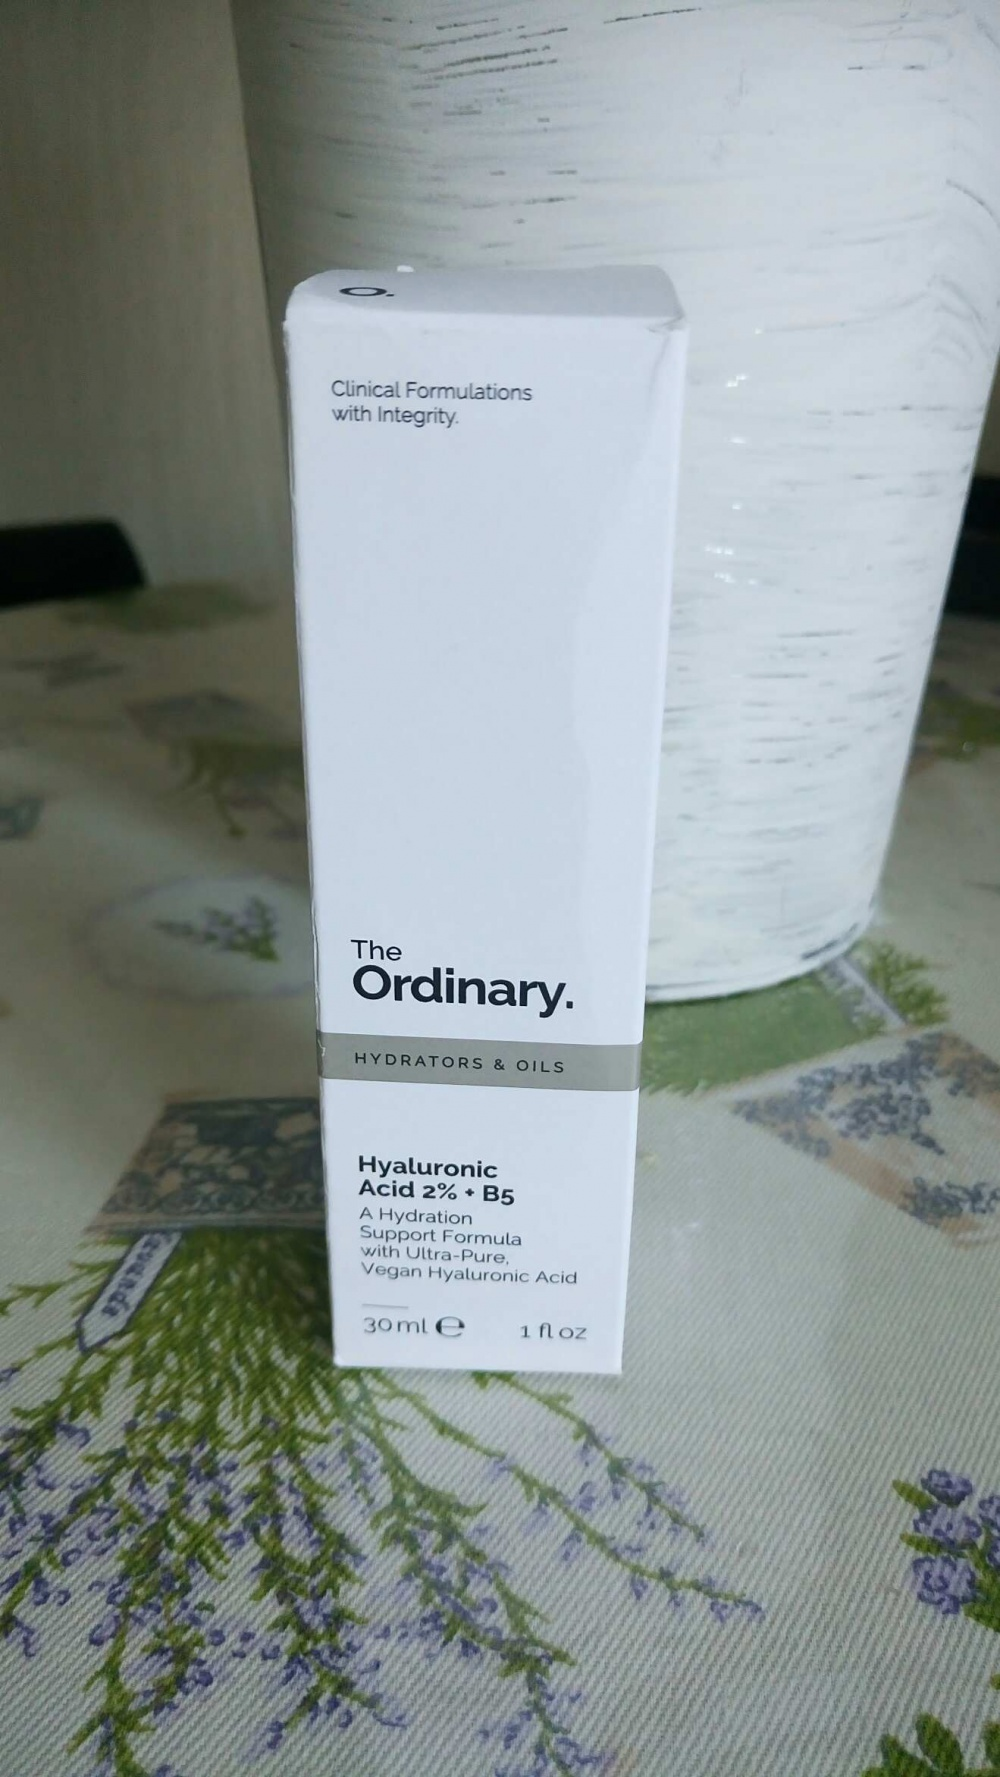 Сыворотка The Ordinary Hyaluronic Acid 2% + B5 30ml